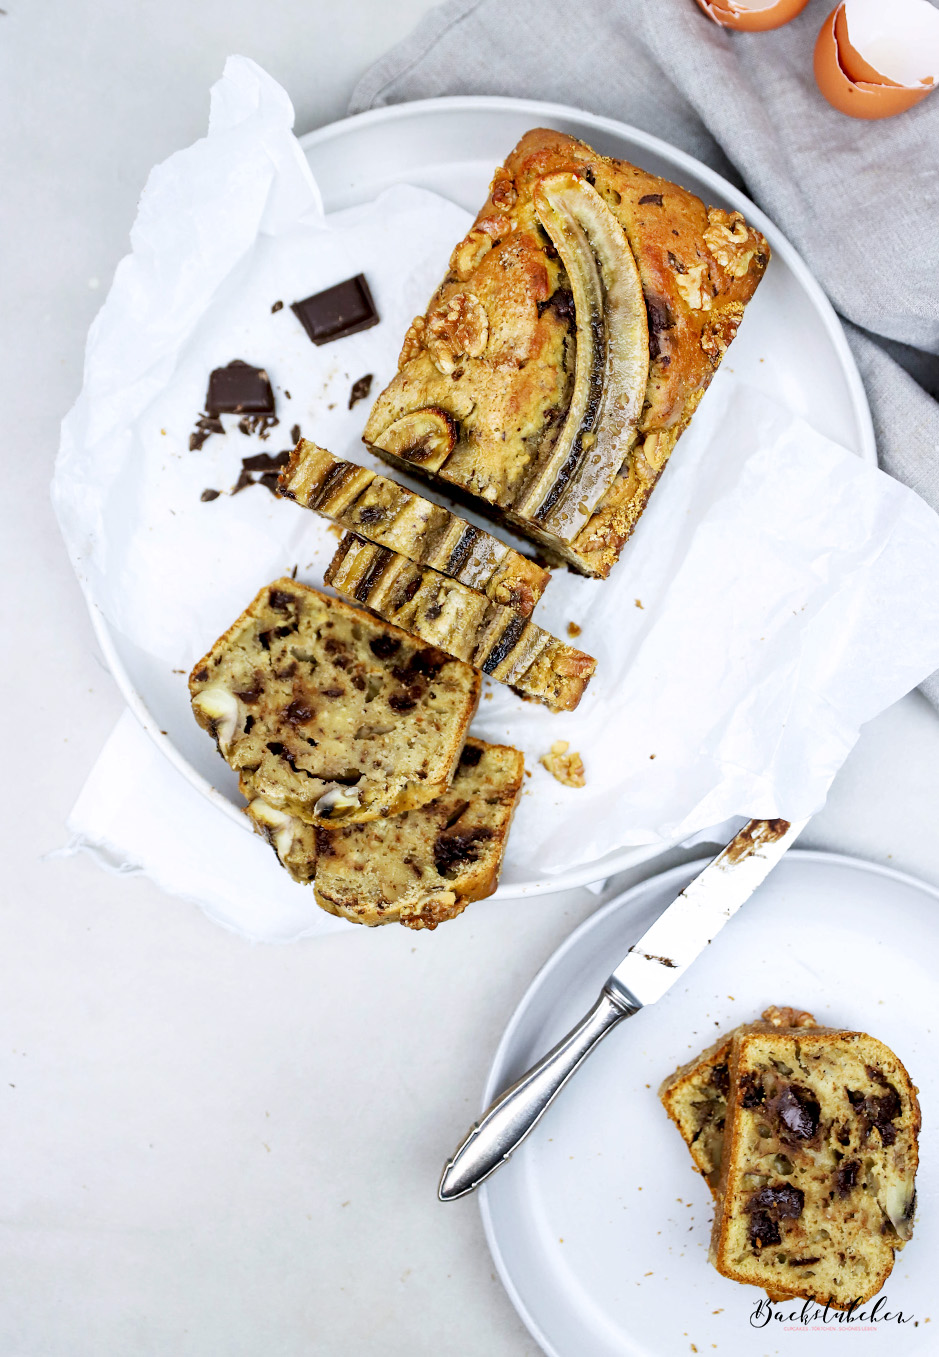 bananenbrot2-1.jpg